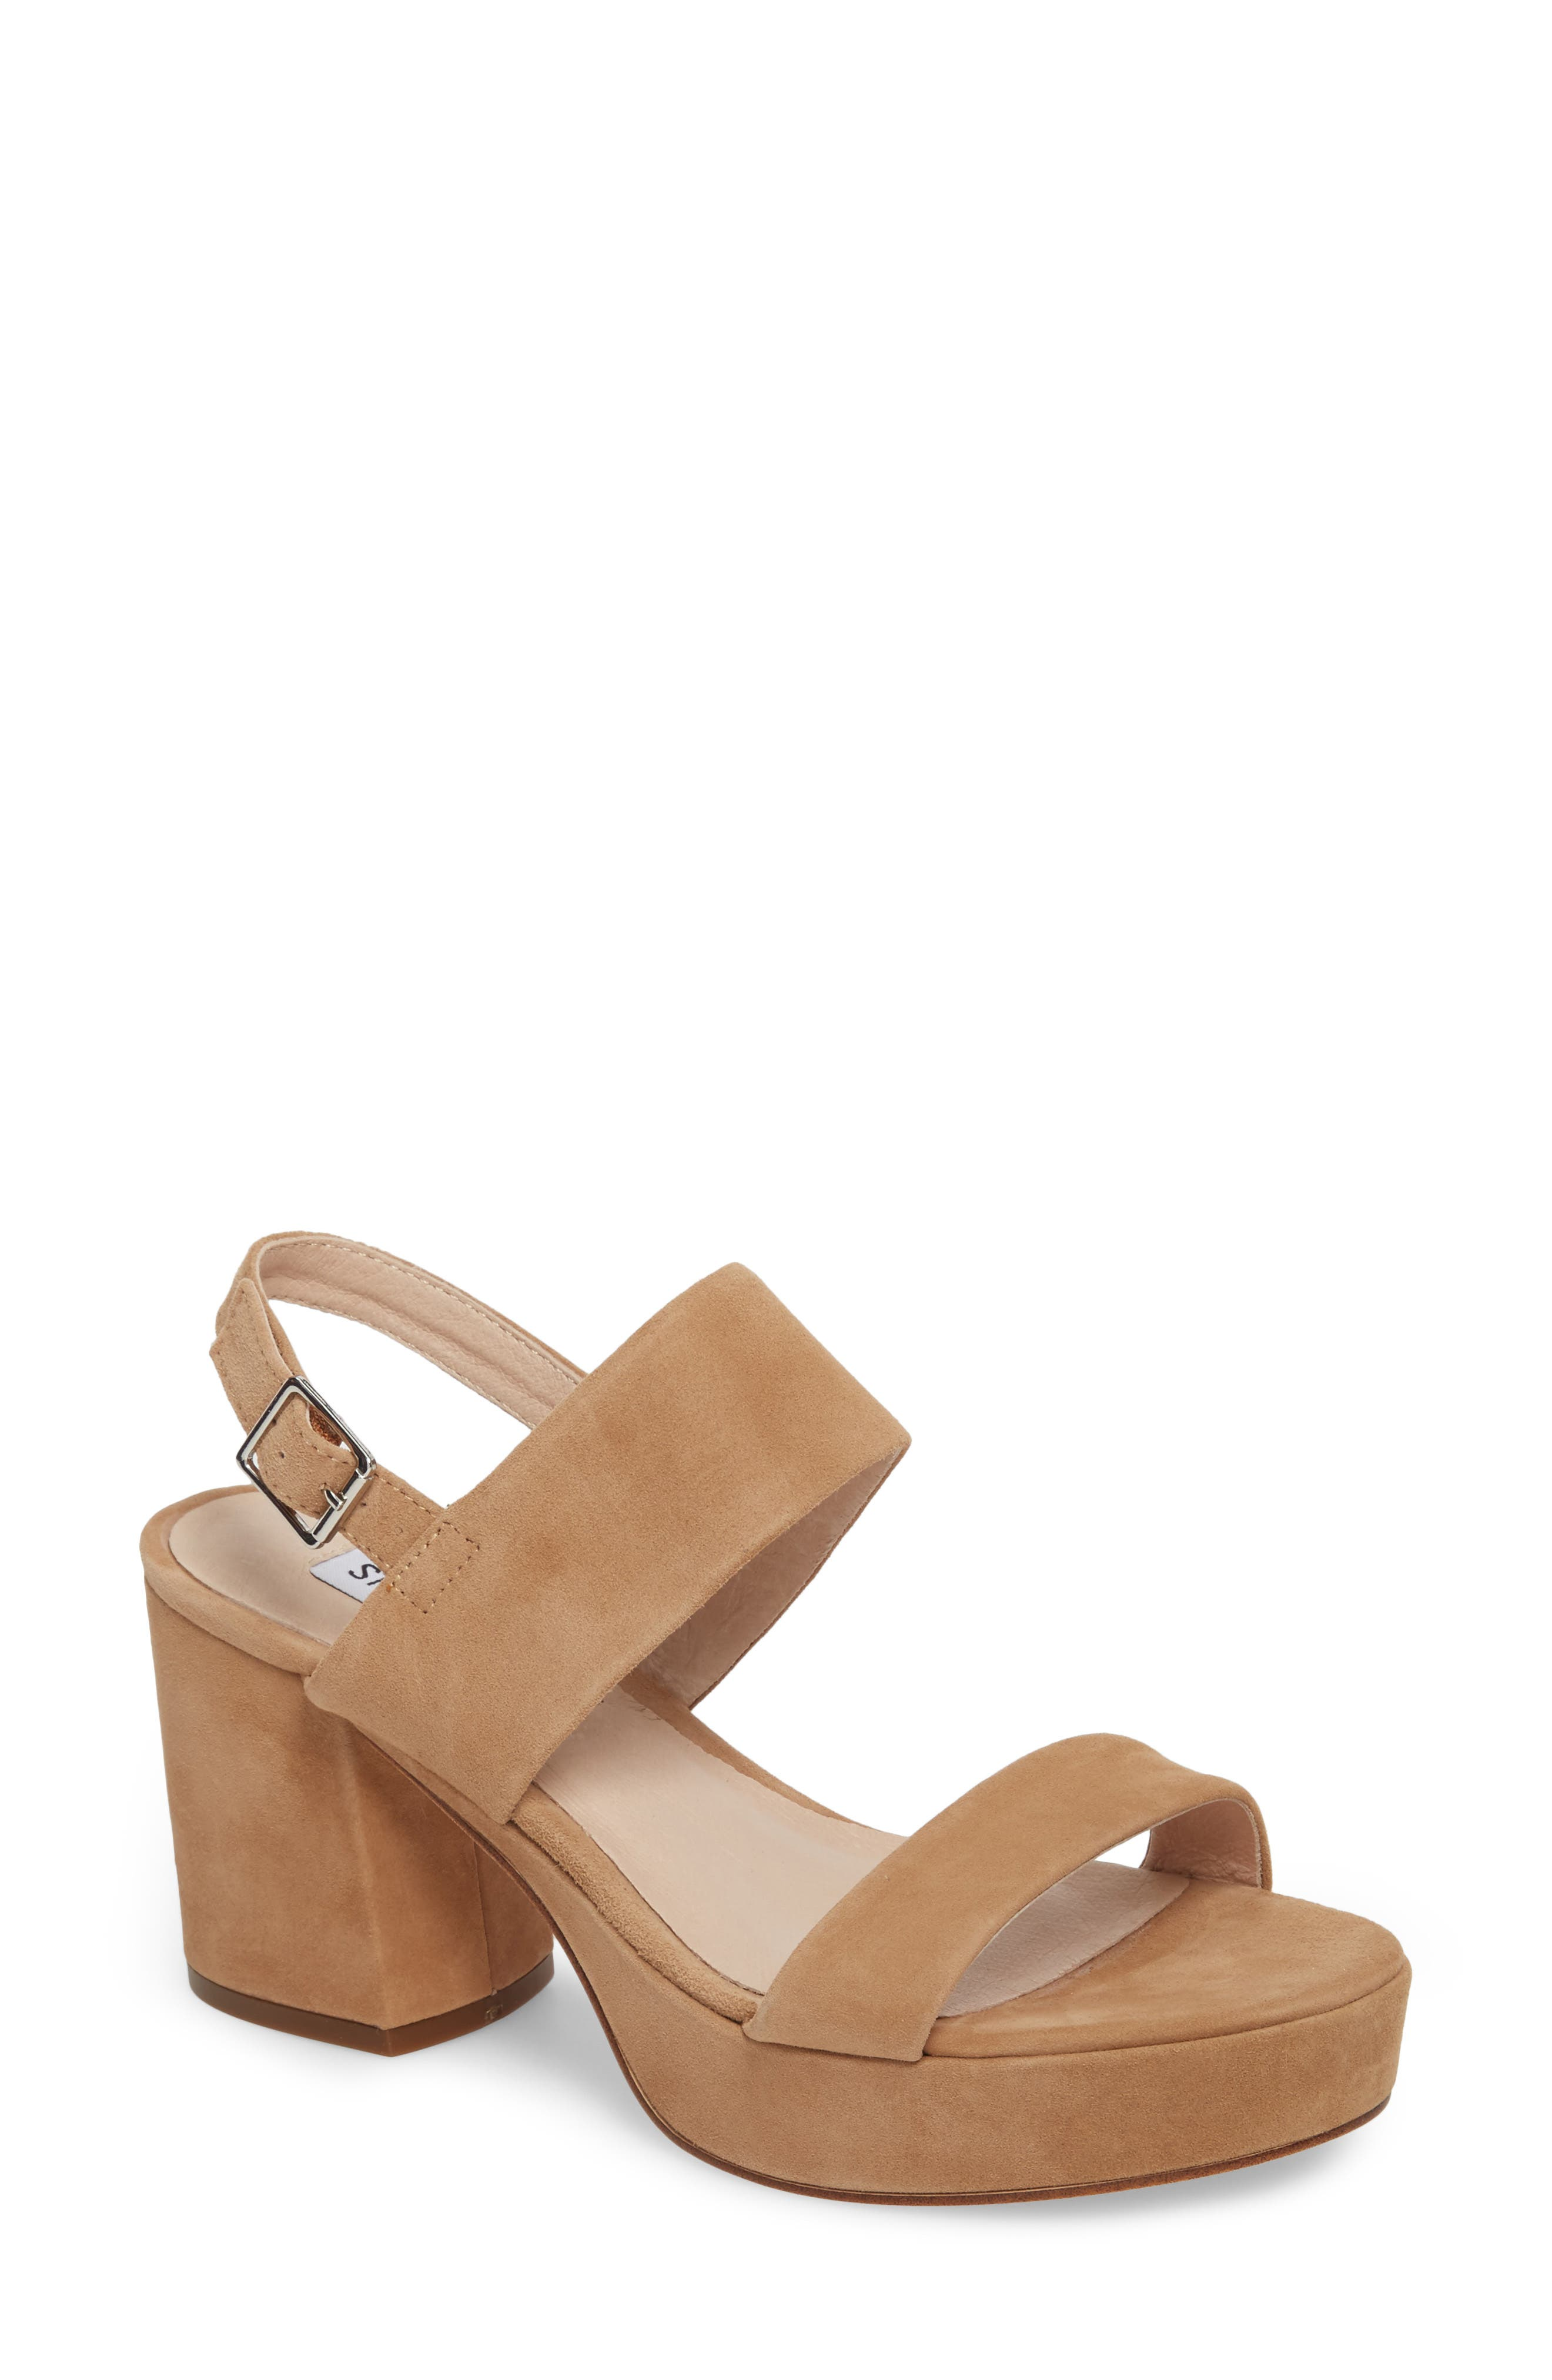 Reba Slingback Platform Sandal,                             Main thumbnail 1, color,                             TAN SUEDE